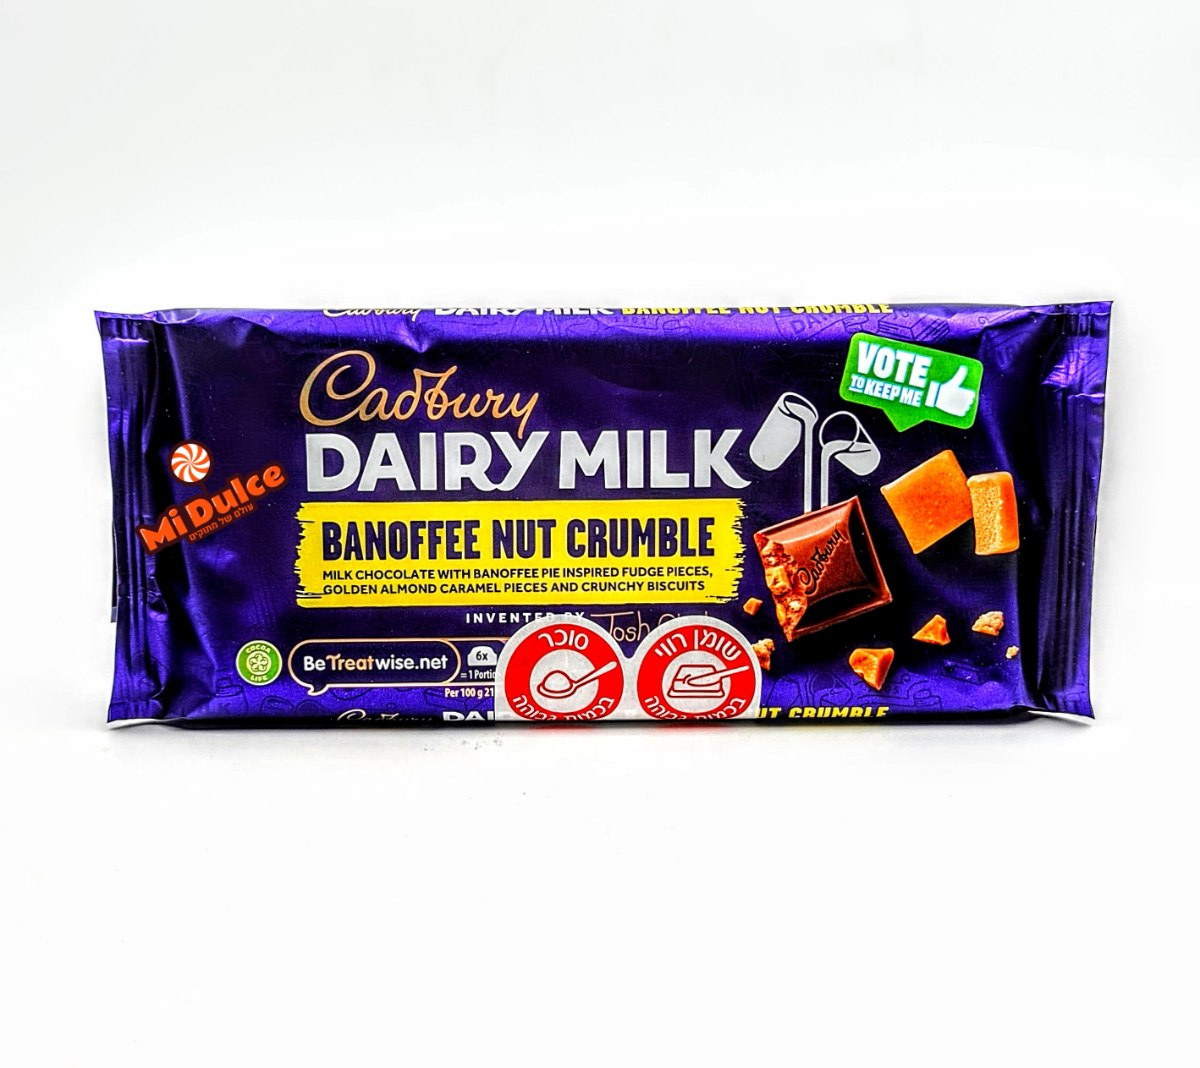 Cadbury טופי שקדים מקורמלים,מהדורה מוגבלת!